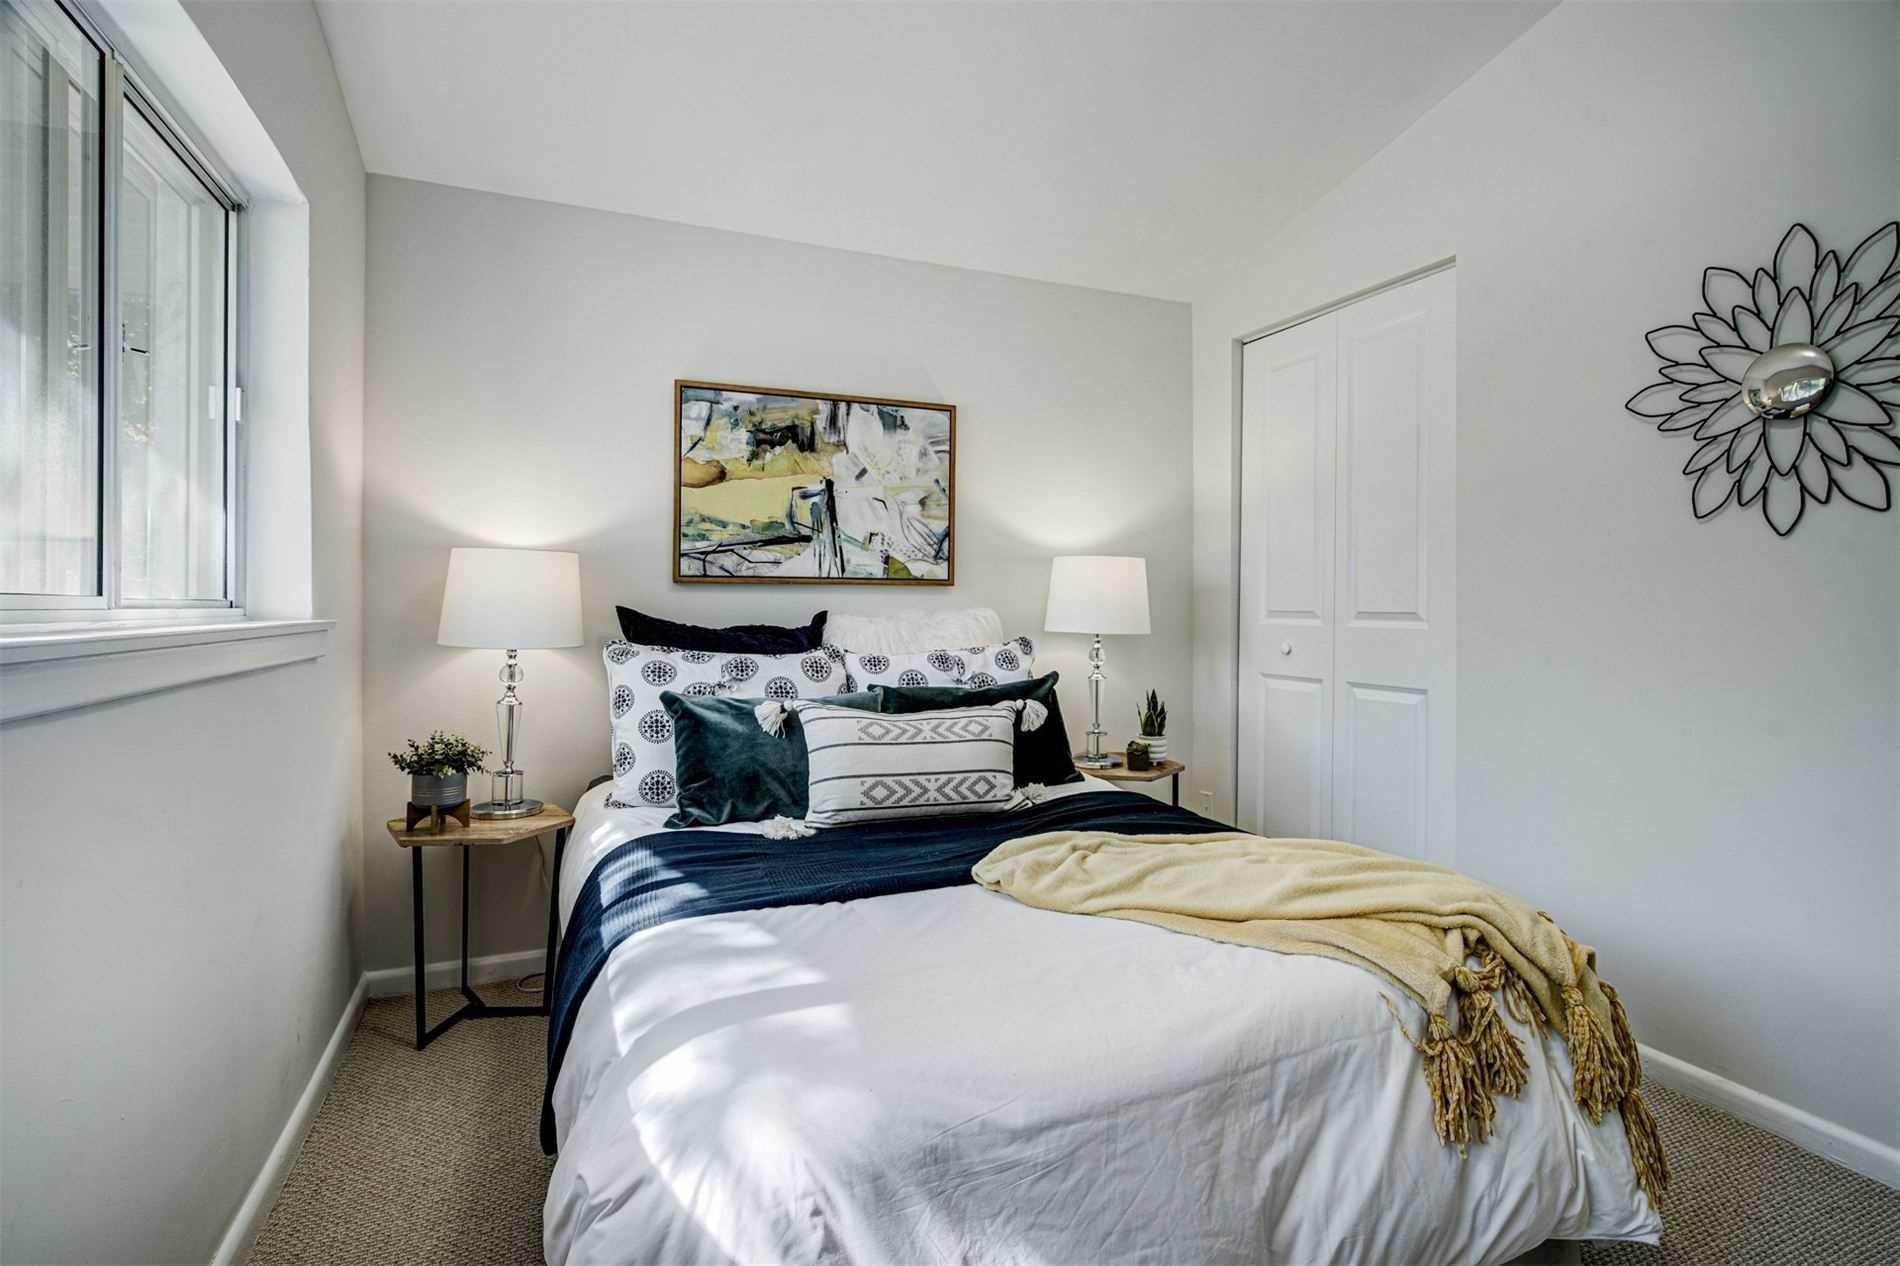 140 Verobeach Blvd - Humbermede Detached for sale, 3 Bedrooms (W5385046) - #19